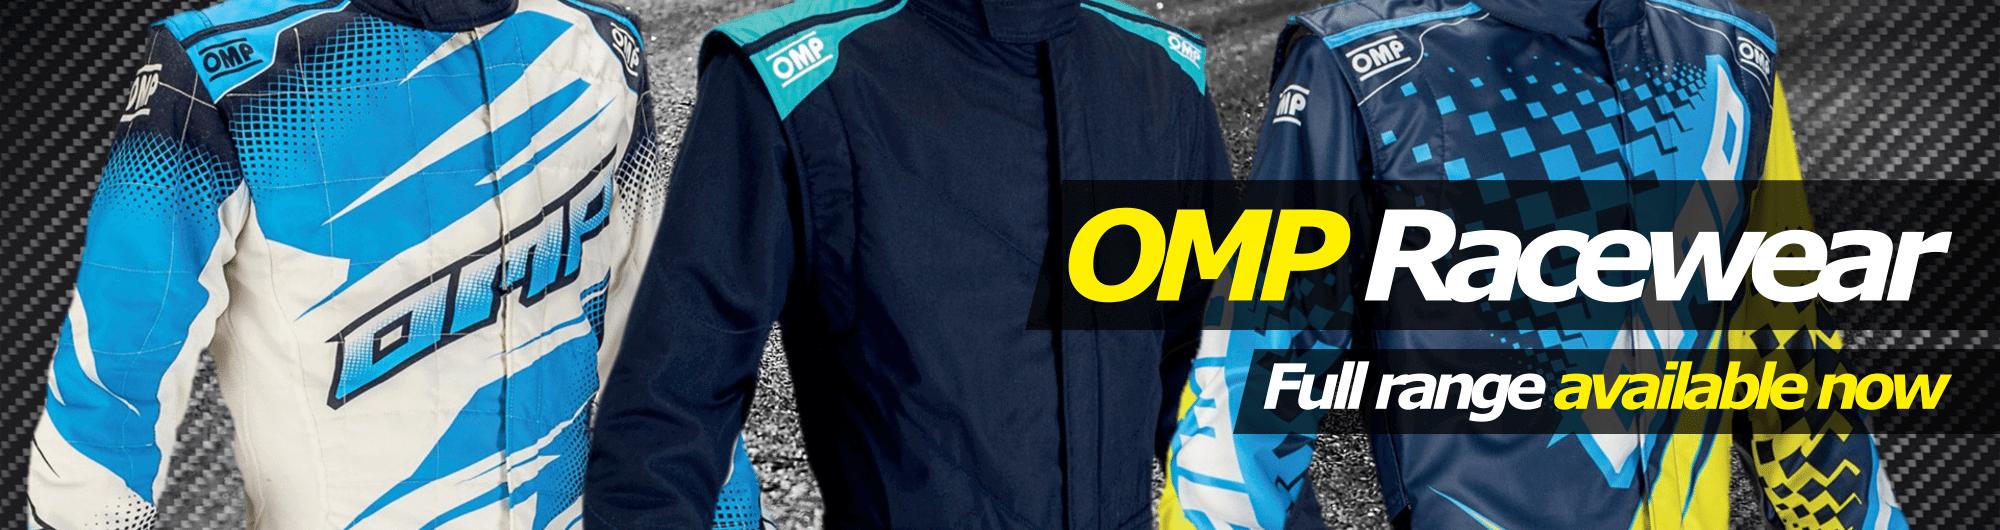 OMP Racewar Slider